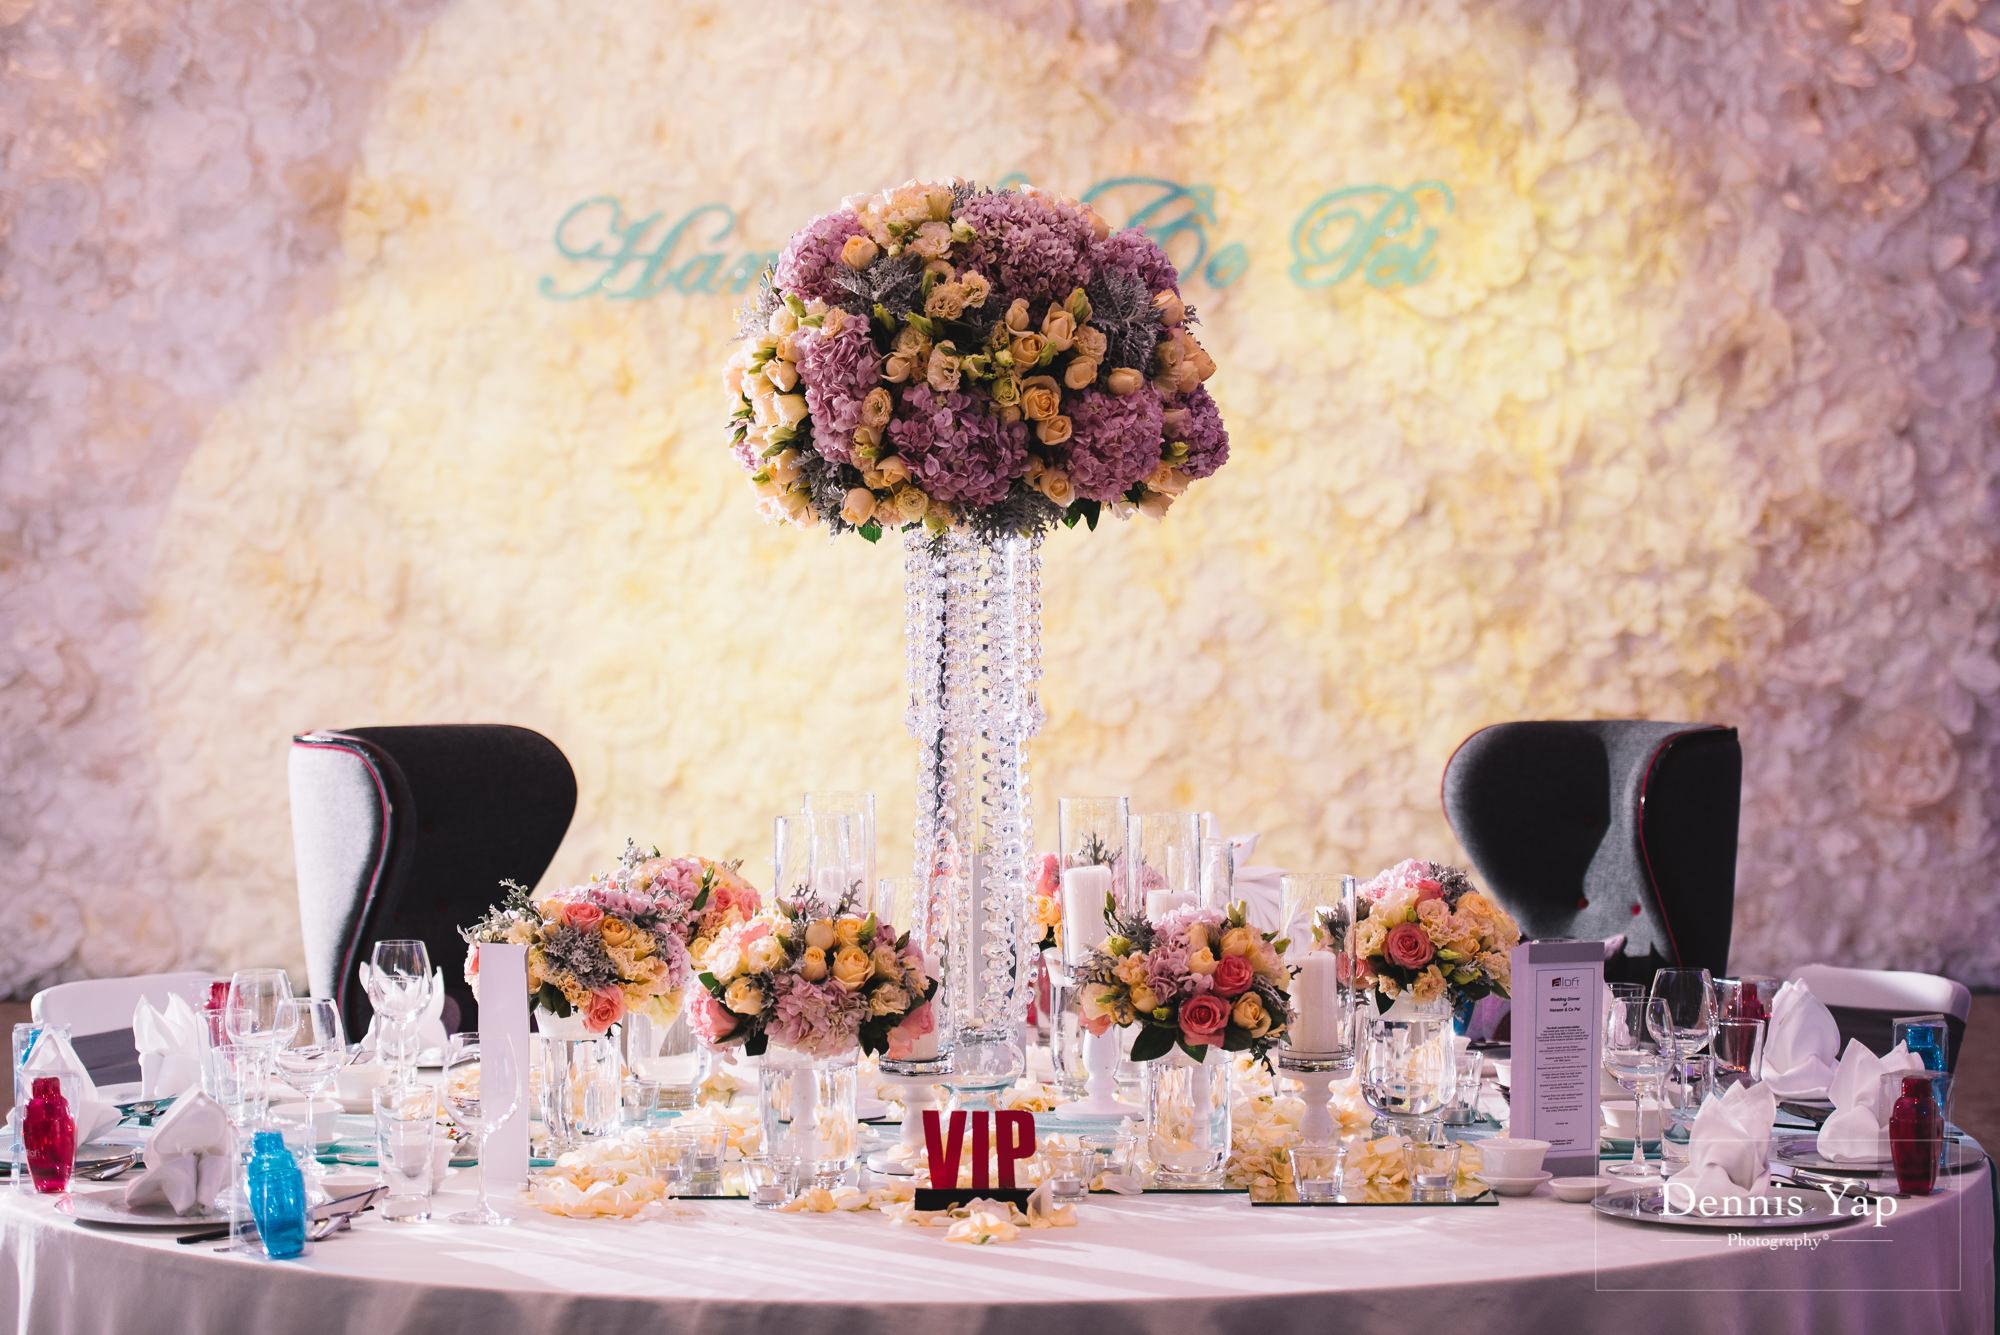 han sen ce pei wedding day A loft hotel kuala lumpur dennis yap photography-18.jpg